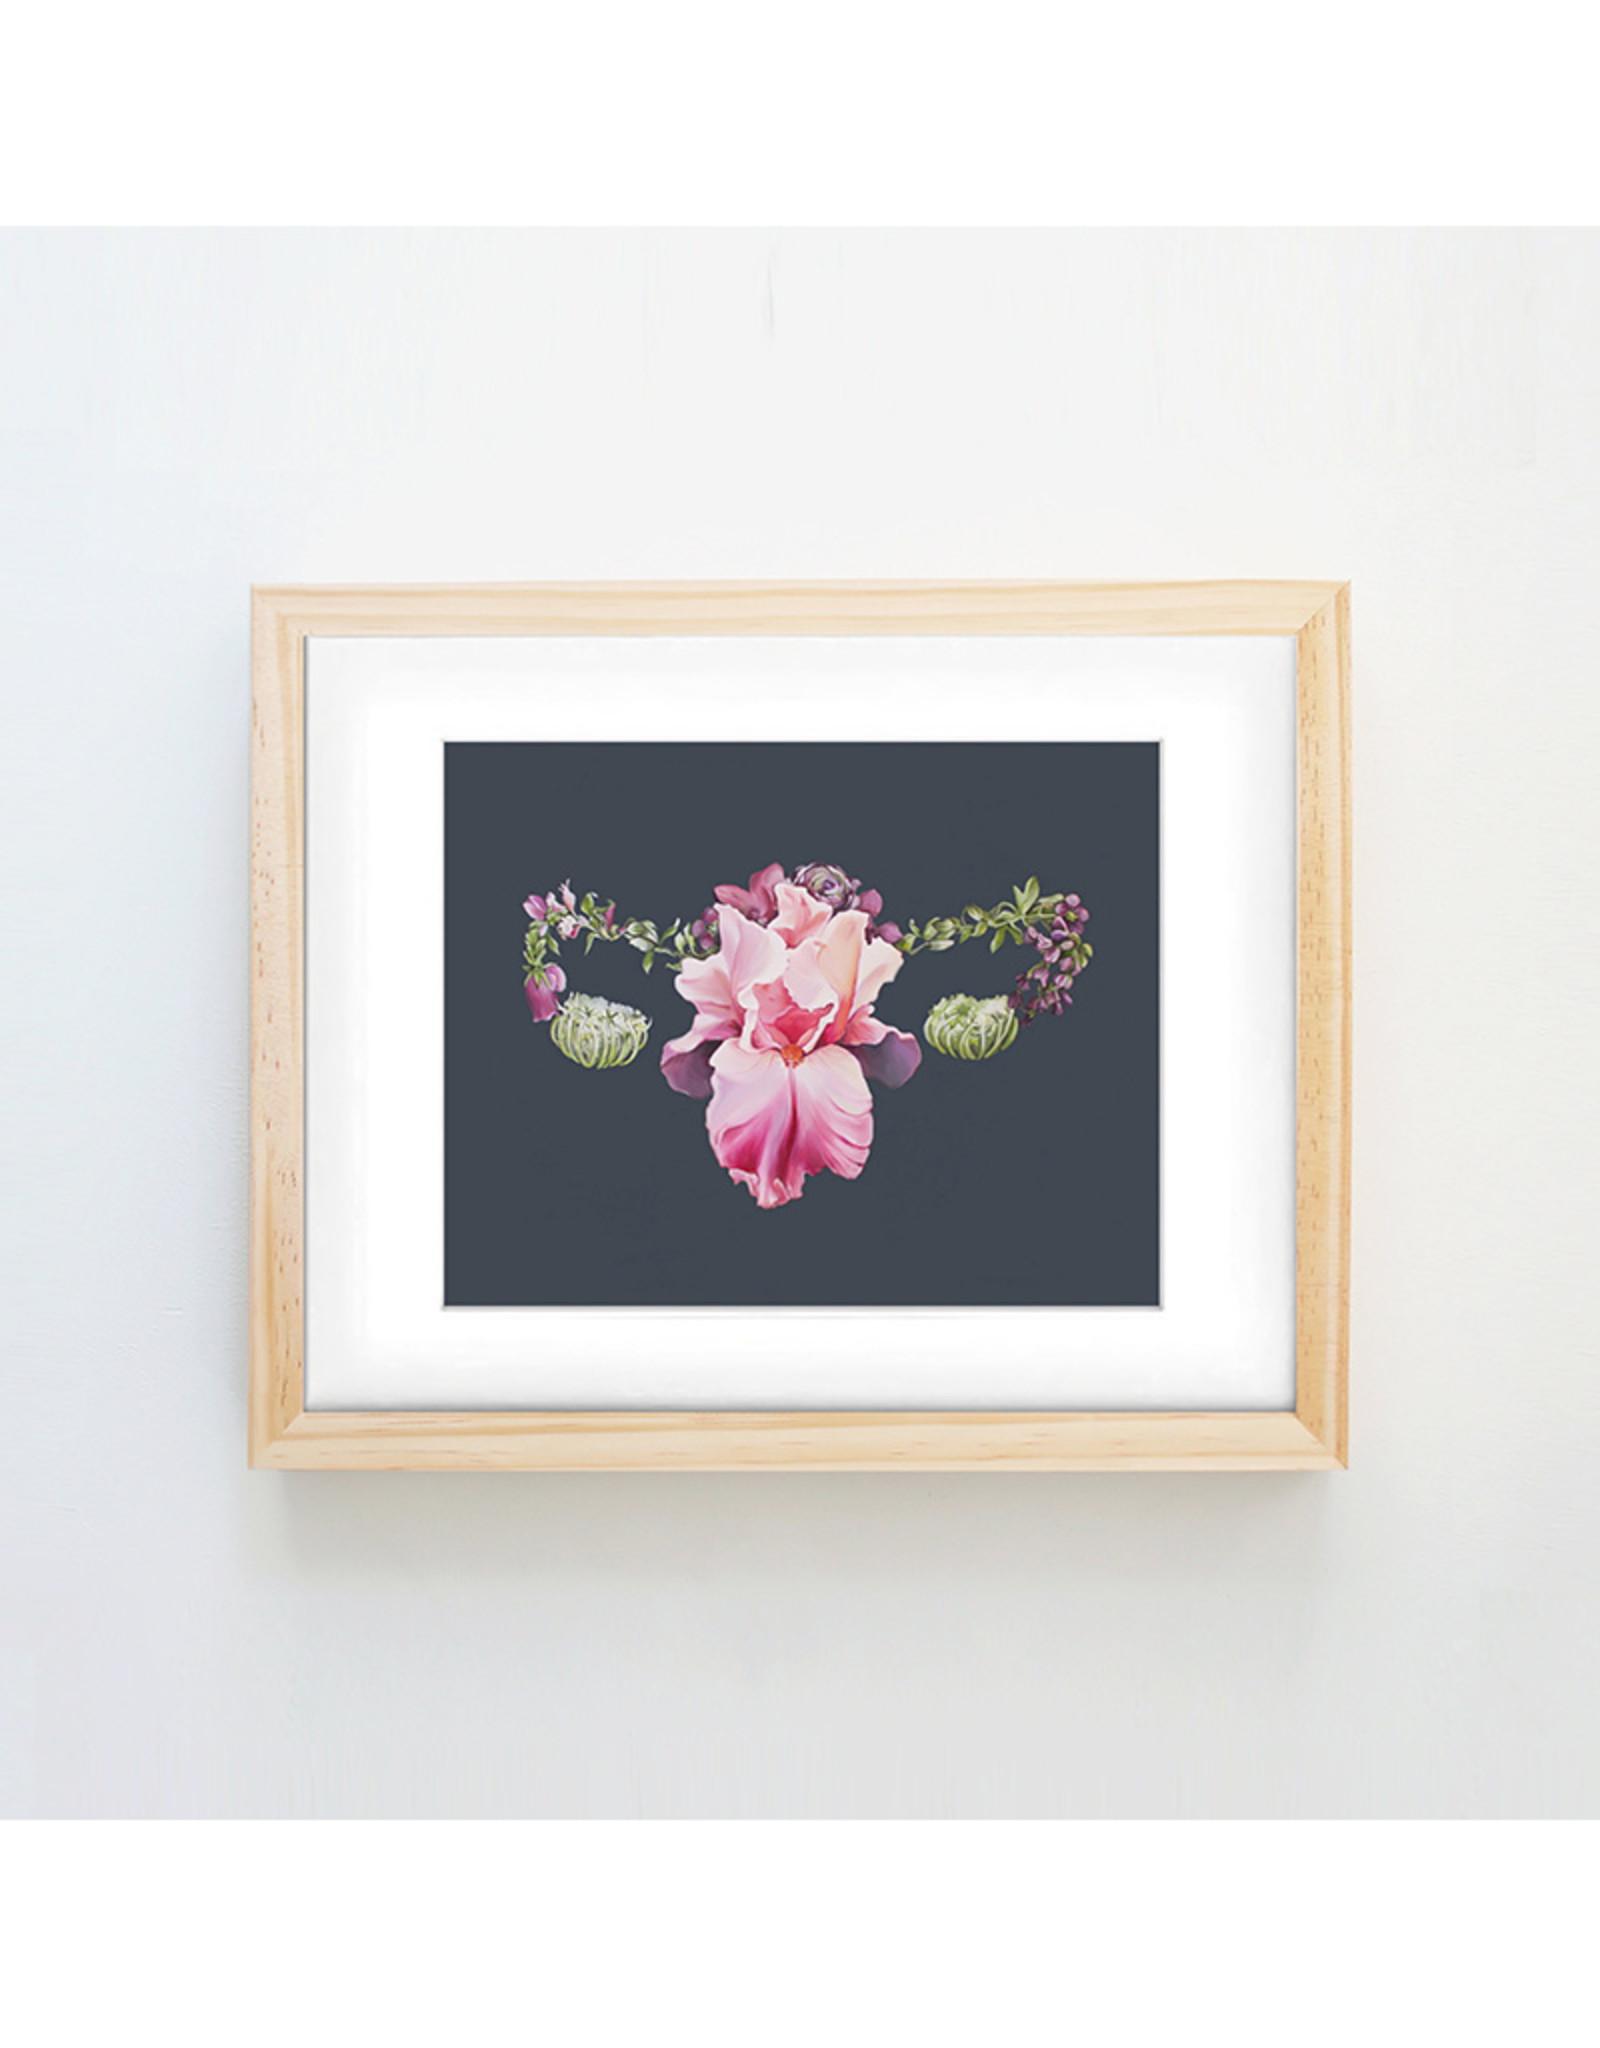 Trisha Thompson Adams  Floral Anatomy Prints by Trisha Thompson Adams